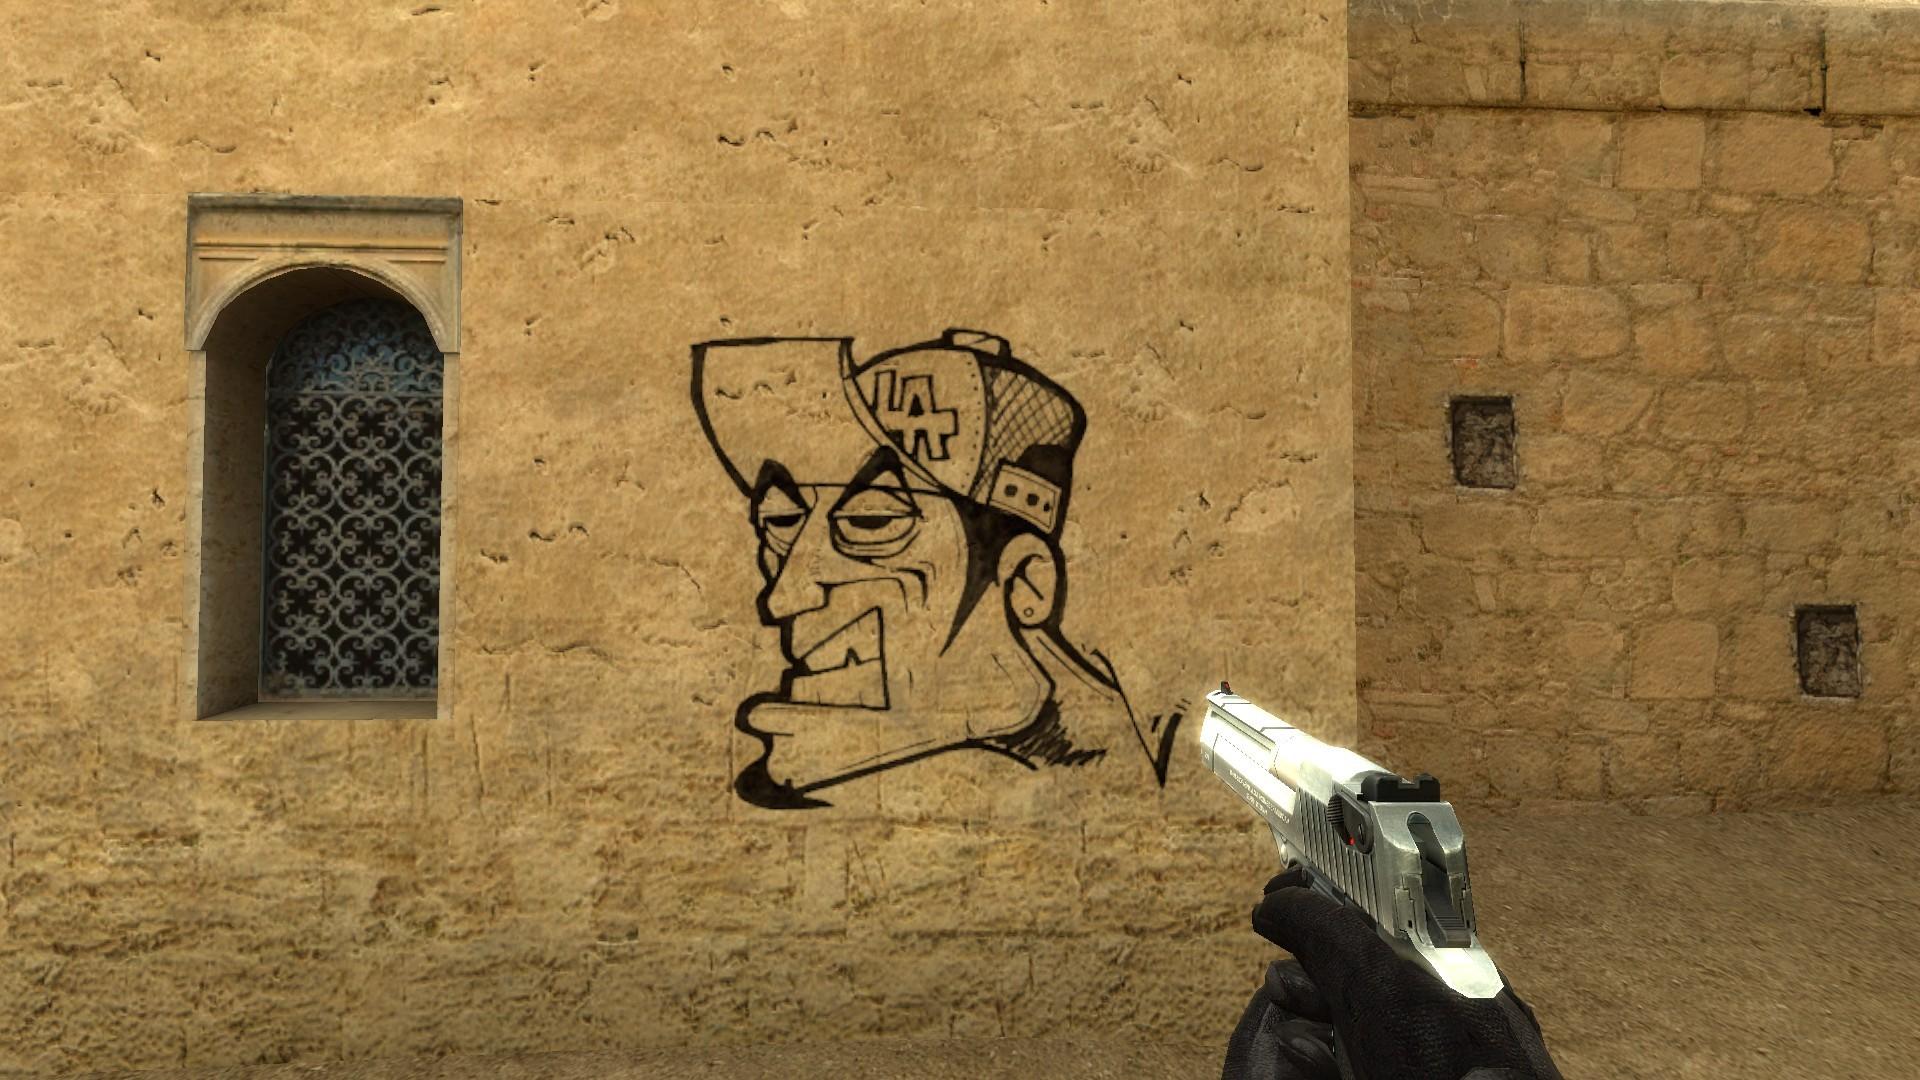 Картинки для граффити в кс, картинки гарри поттера